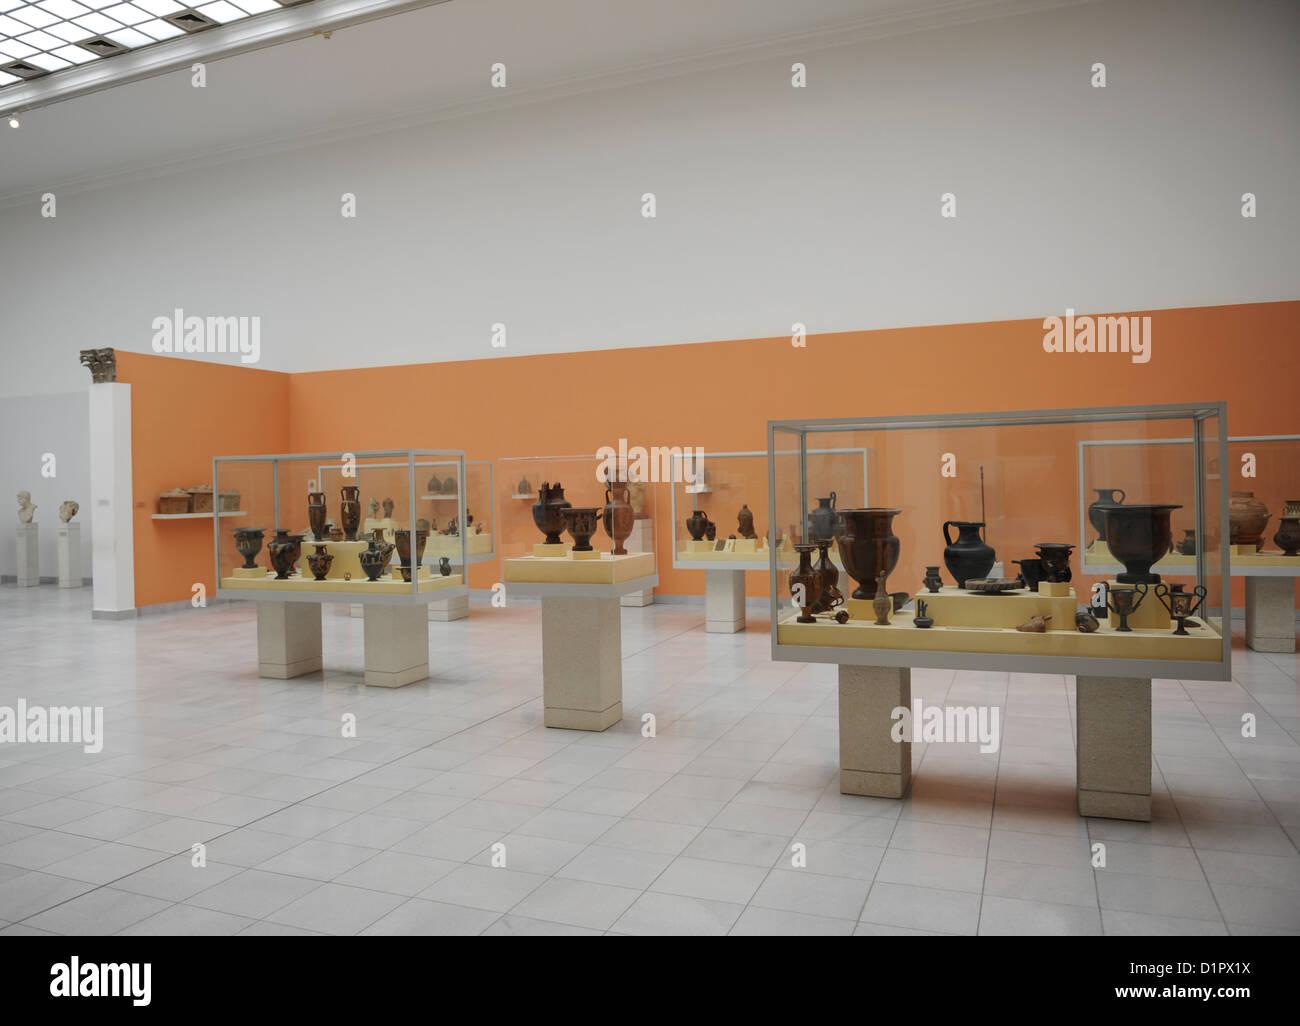 Hungary. Budapest. Museum of Fine Arts. Interior. - Stock Image